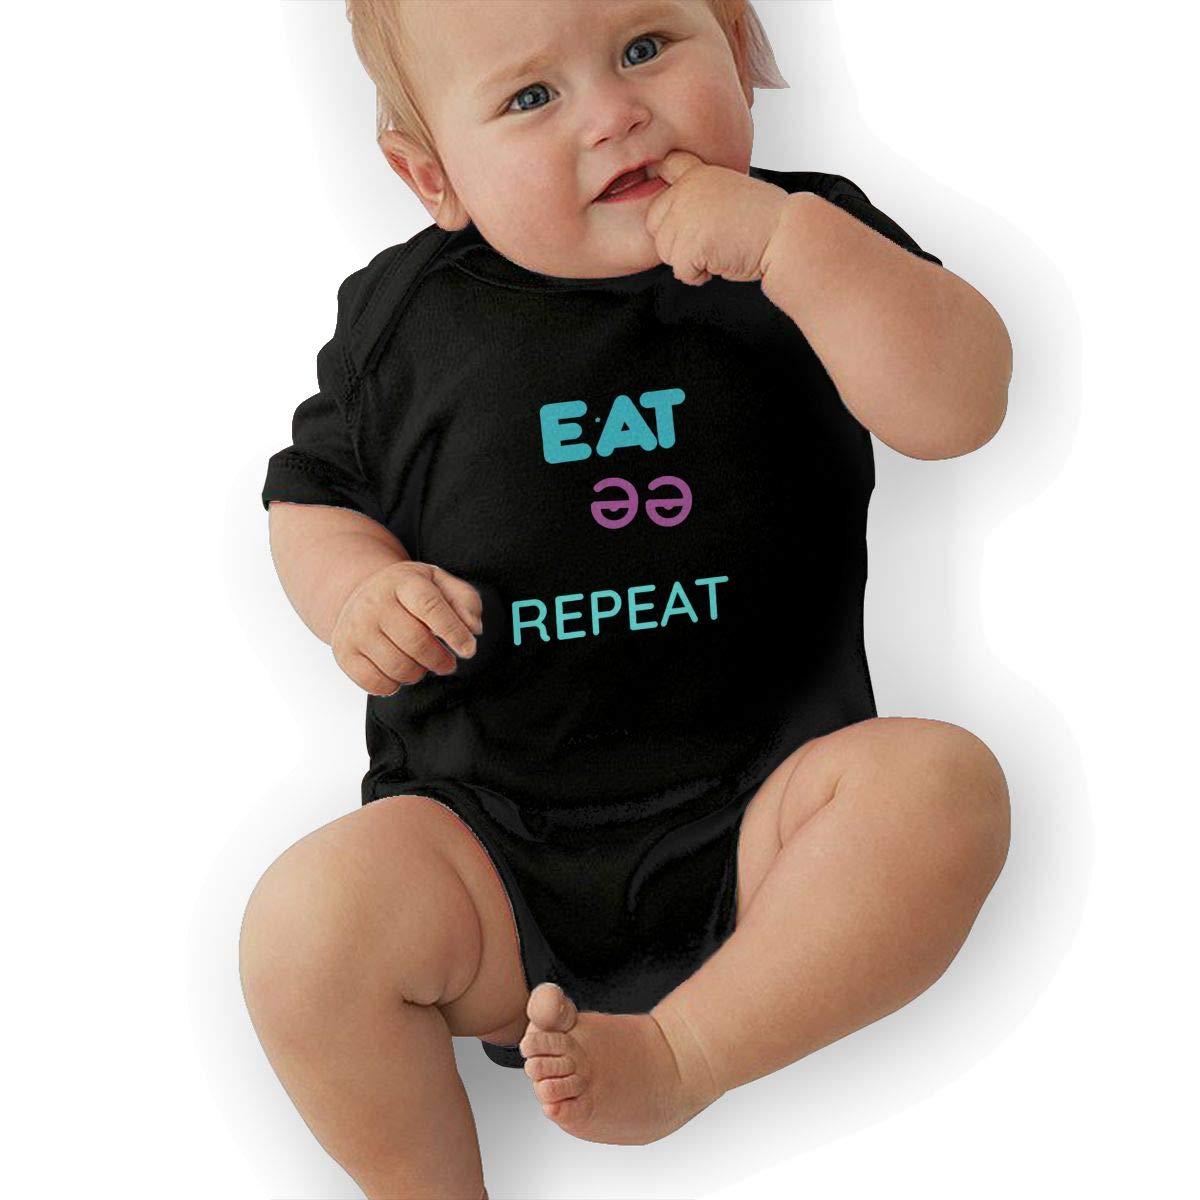 Eat Sleep Rave Repeat Newborn Infant Toddler Baby Girls Boys Bodysuit Short Sleeve 0-24 MonthsBlack